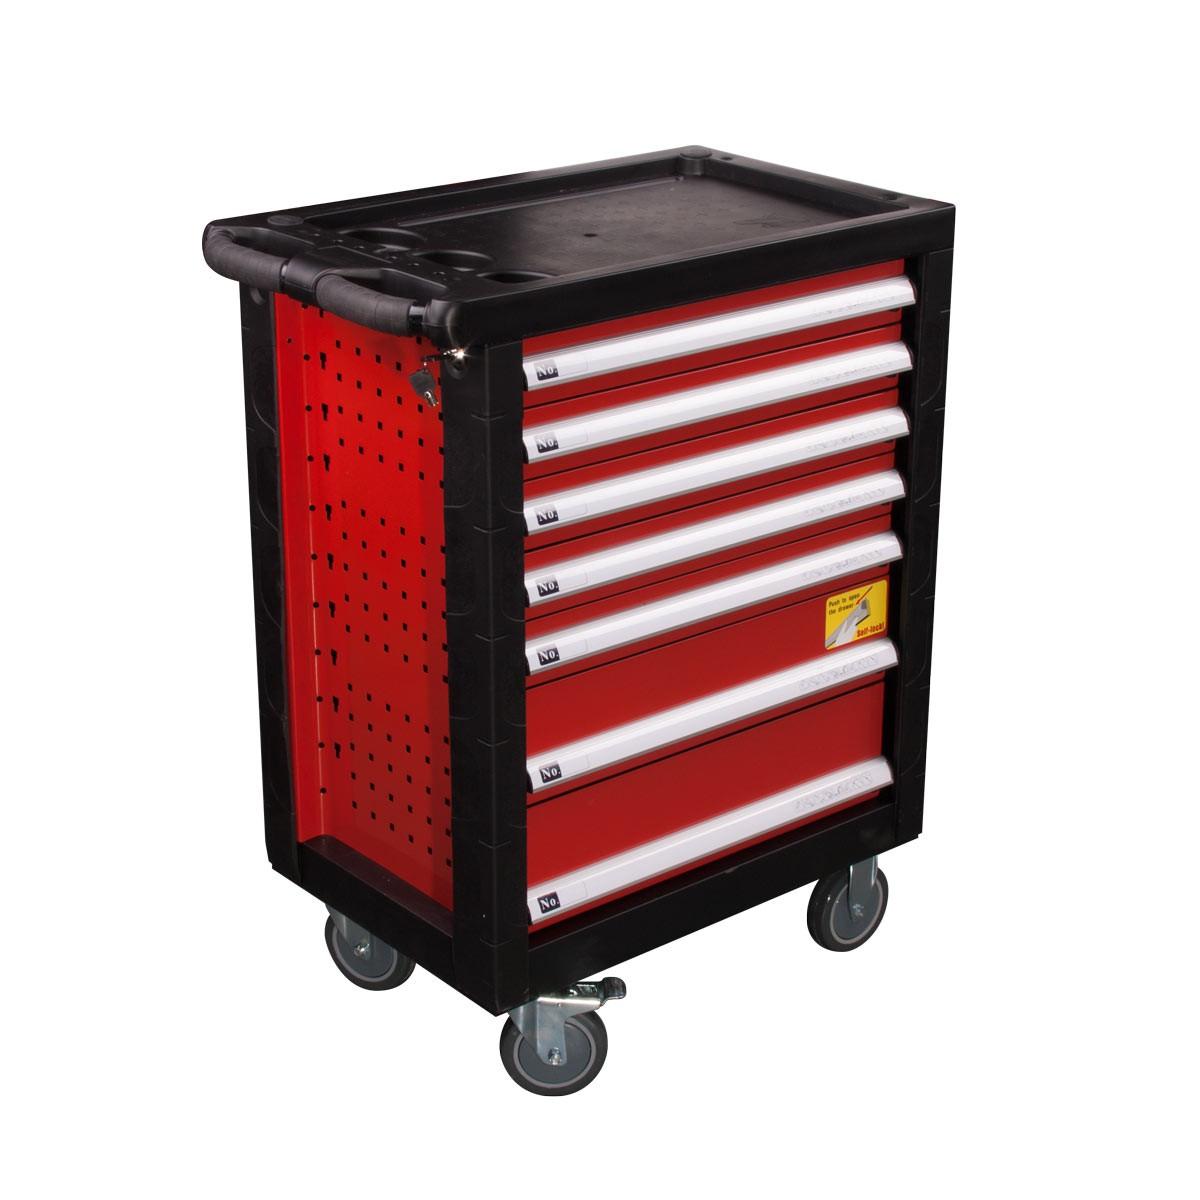 Atenci n caja para herramientas con 7 cajonera incl carro for Cajon herramientas taller